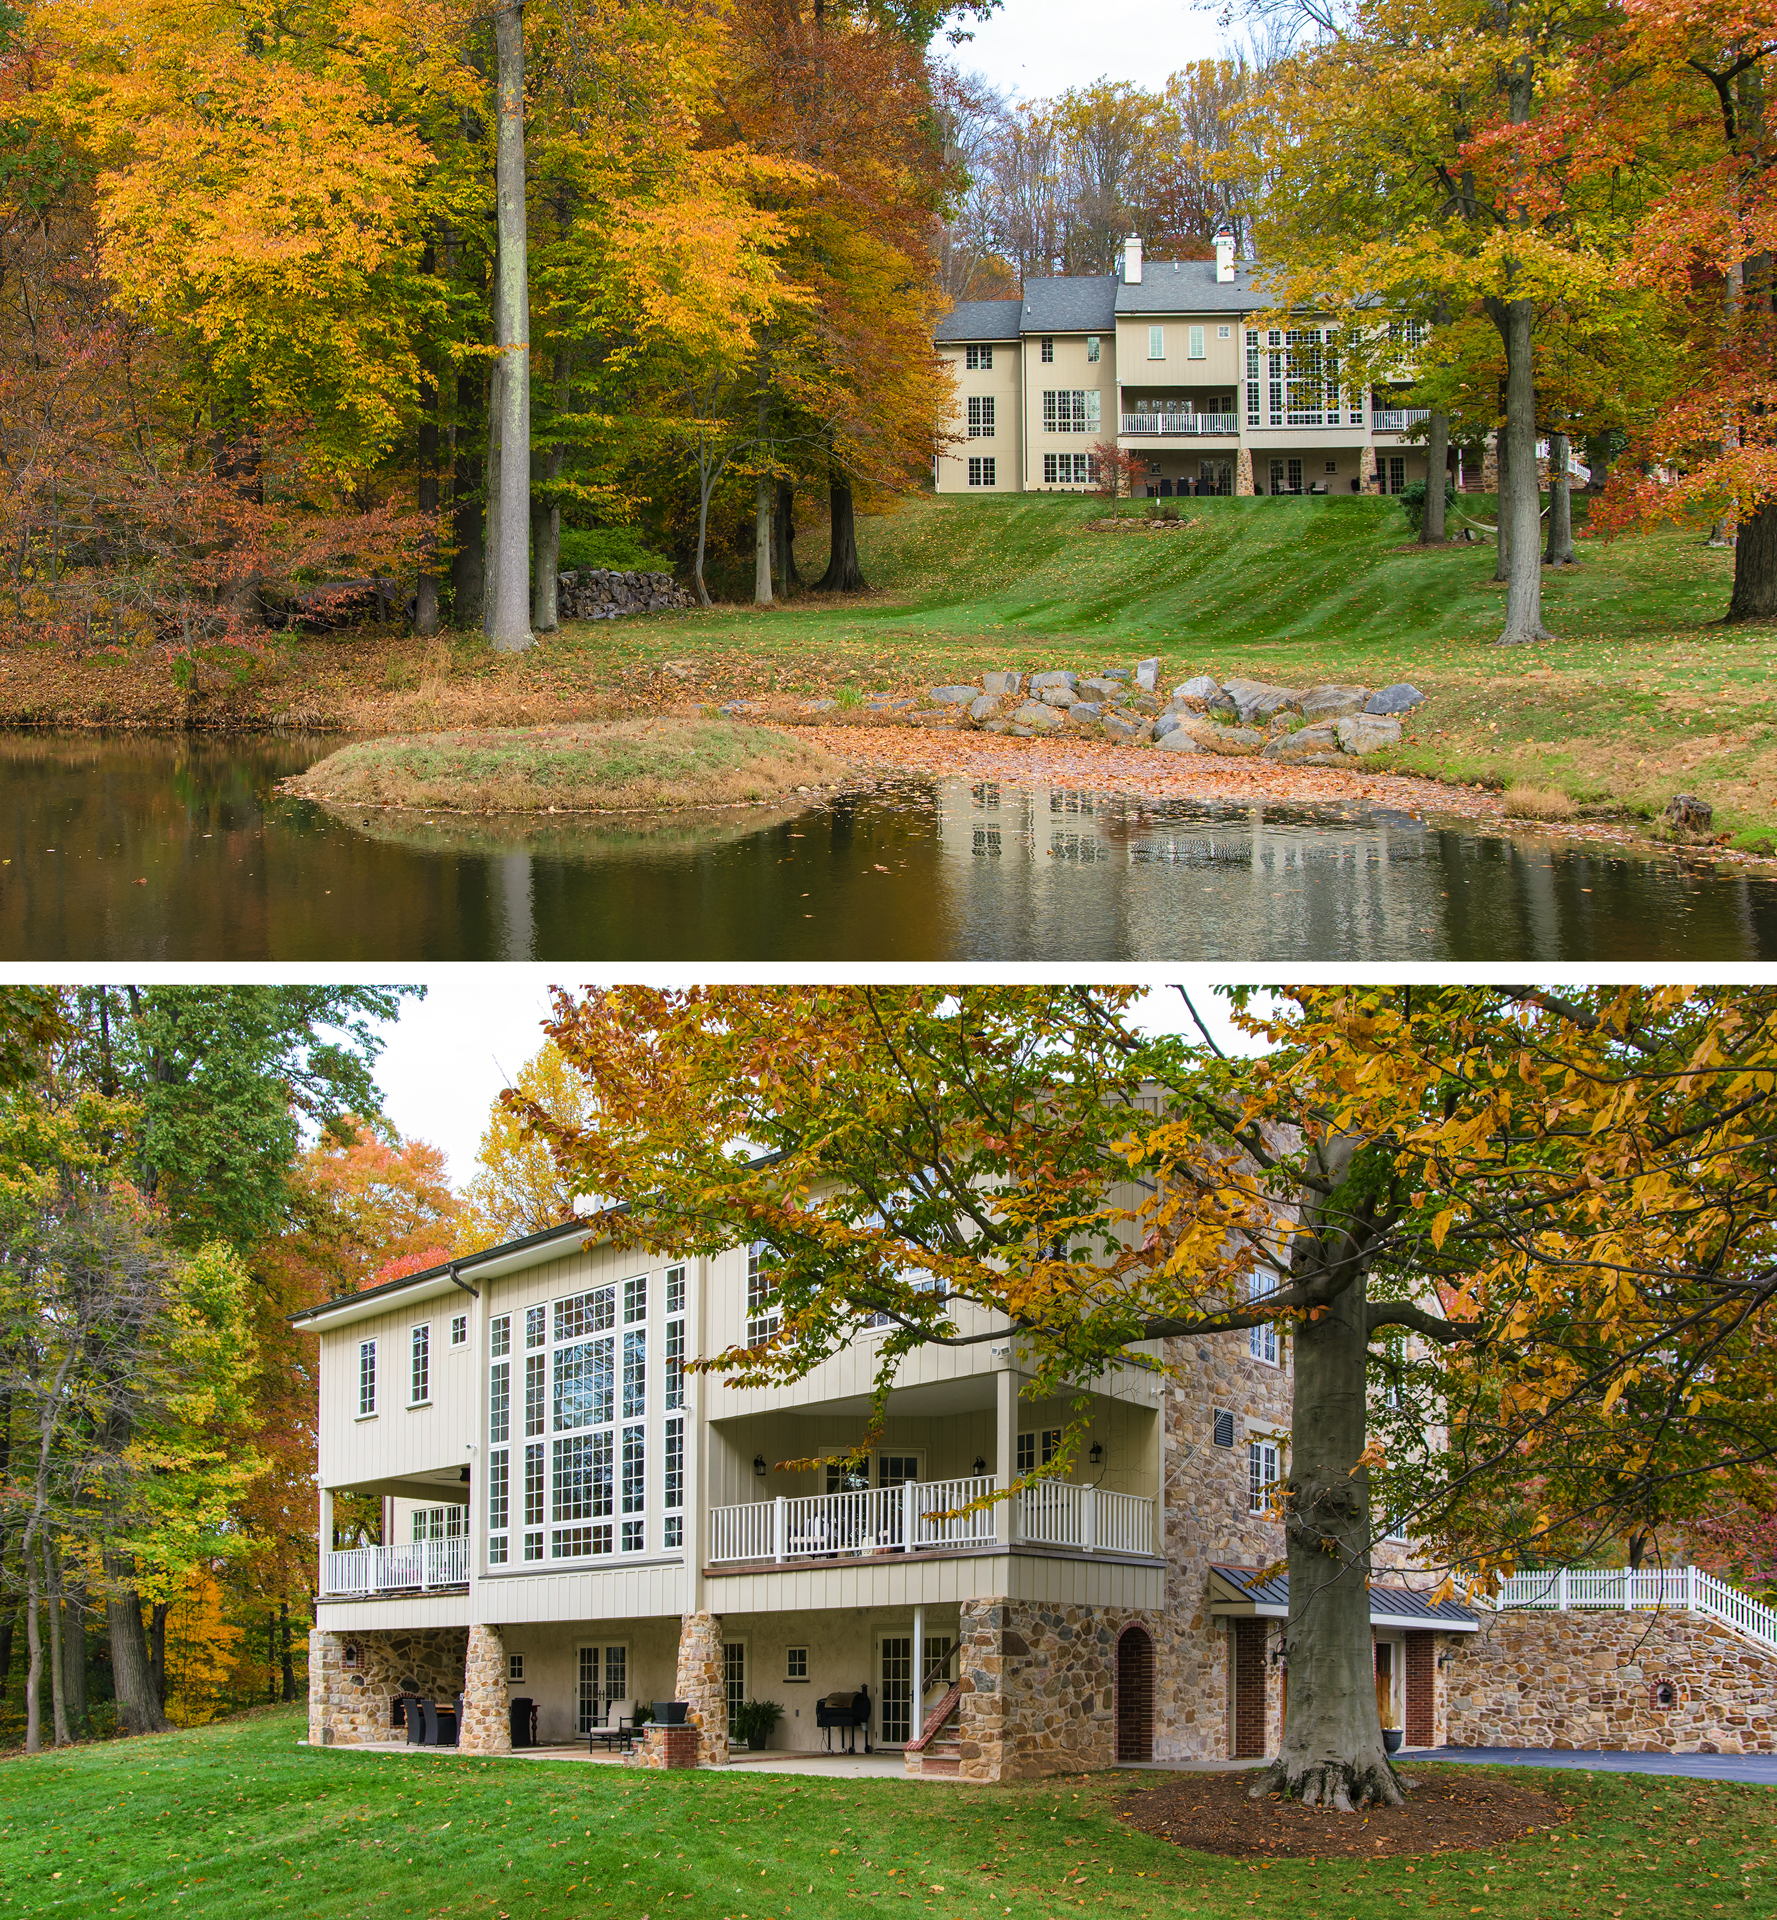 Fabulous Fall colors in Malvern, PA